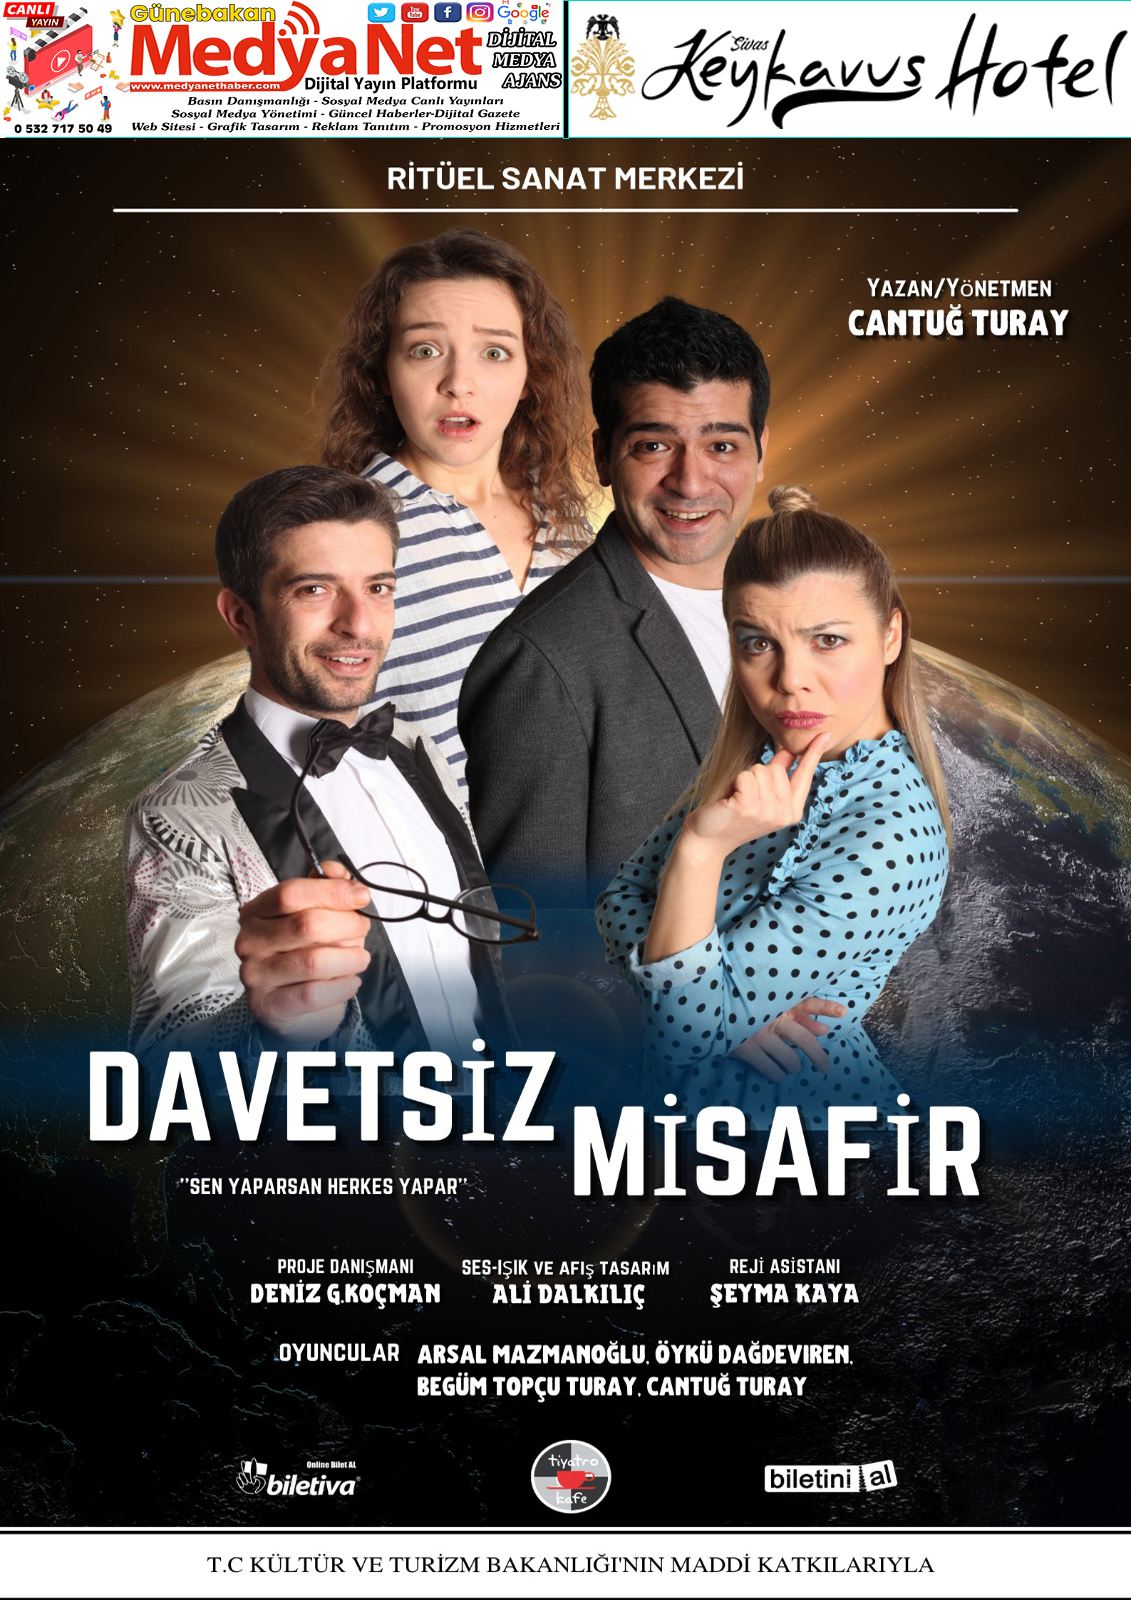 Davetsiz Misafir Tiyatro Oyunu 25 Şubat'ta Sivas'ta